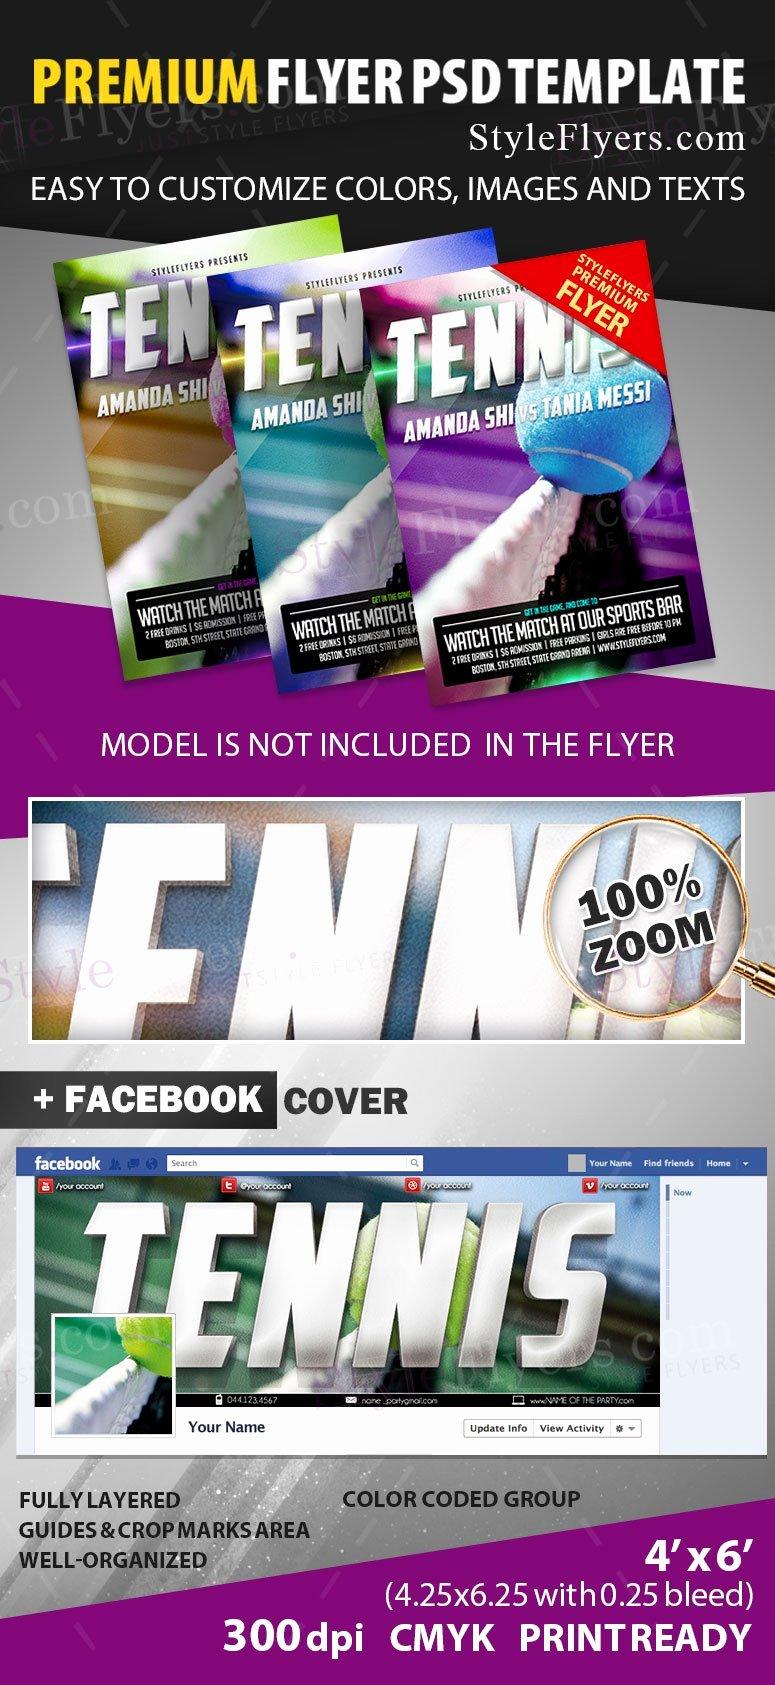 Tennis Flyer Template Free Luxury Tennis Psd Flyer Template Styleflyers